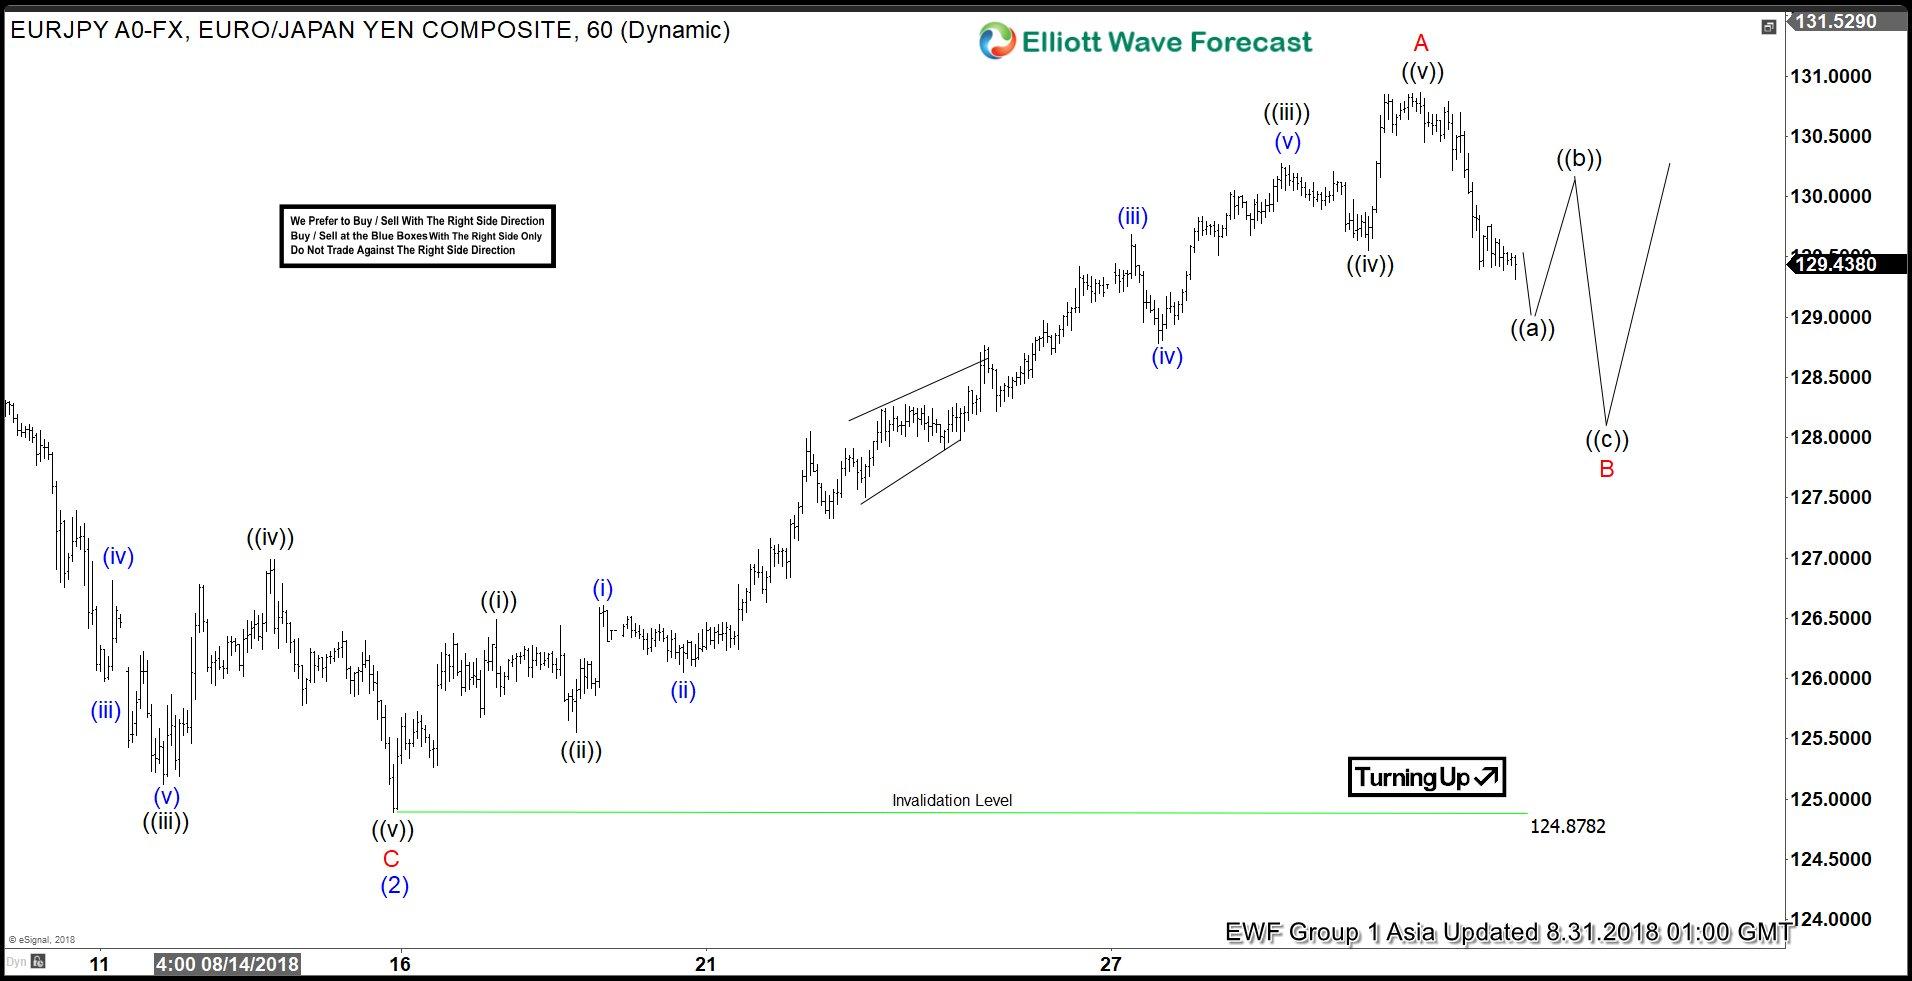 EURJPY Elliott Wave View: Ended 5 Waves Advance